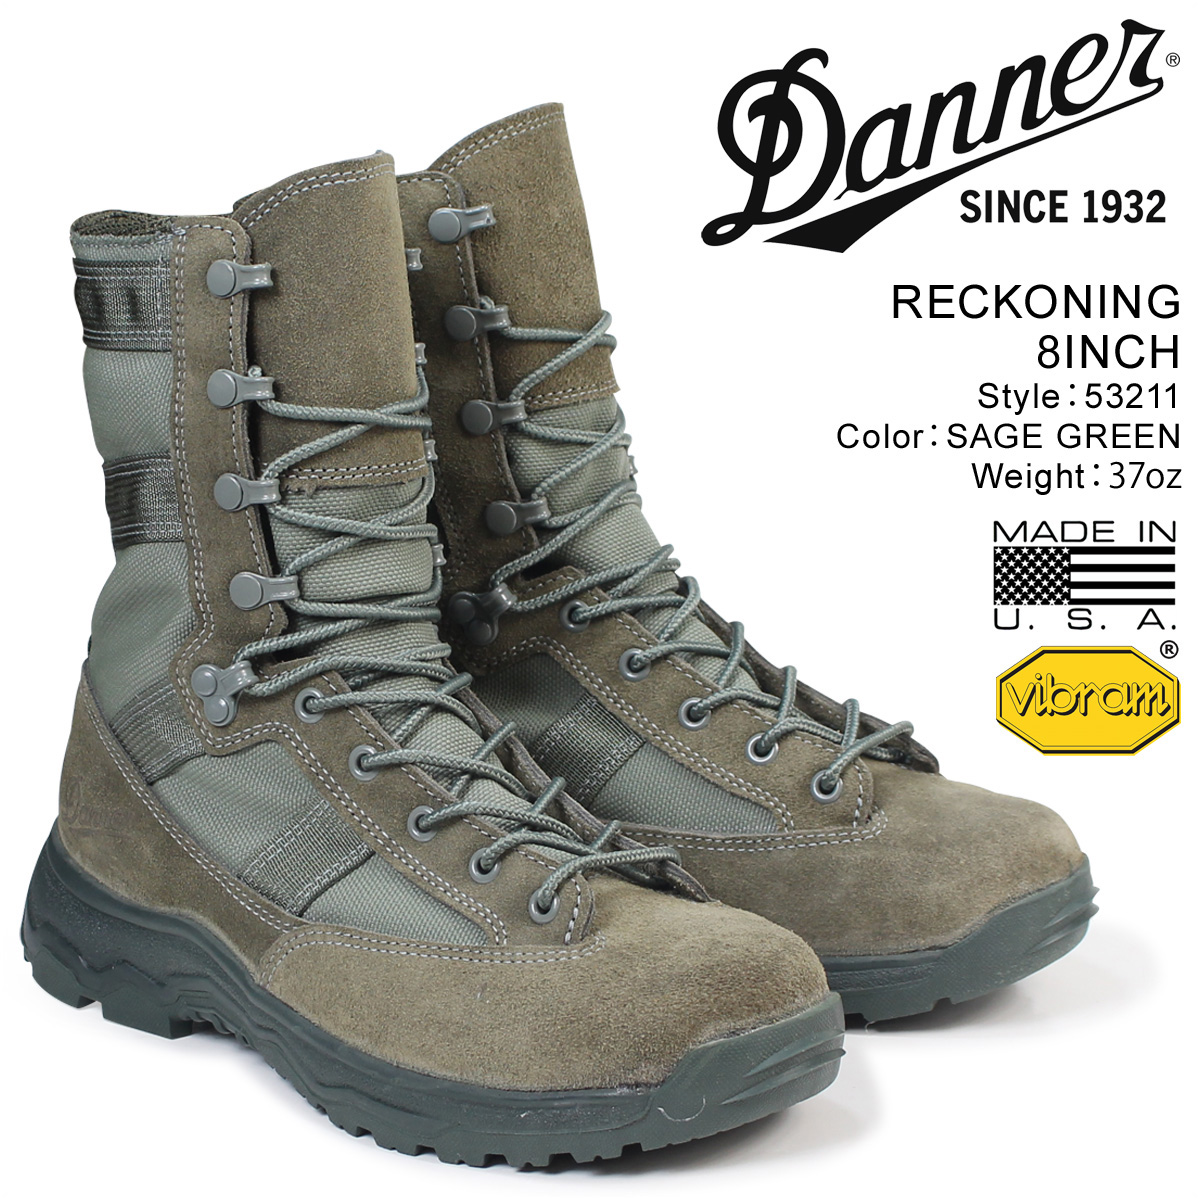 DANNER ブーツ ダナー RECKONING 8INCH 53211 メンズ グリーン